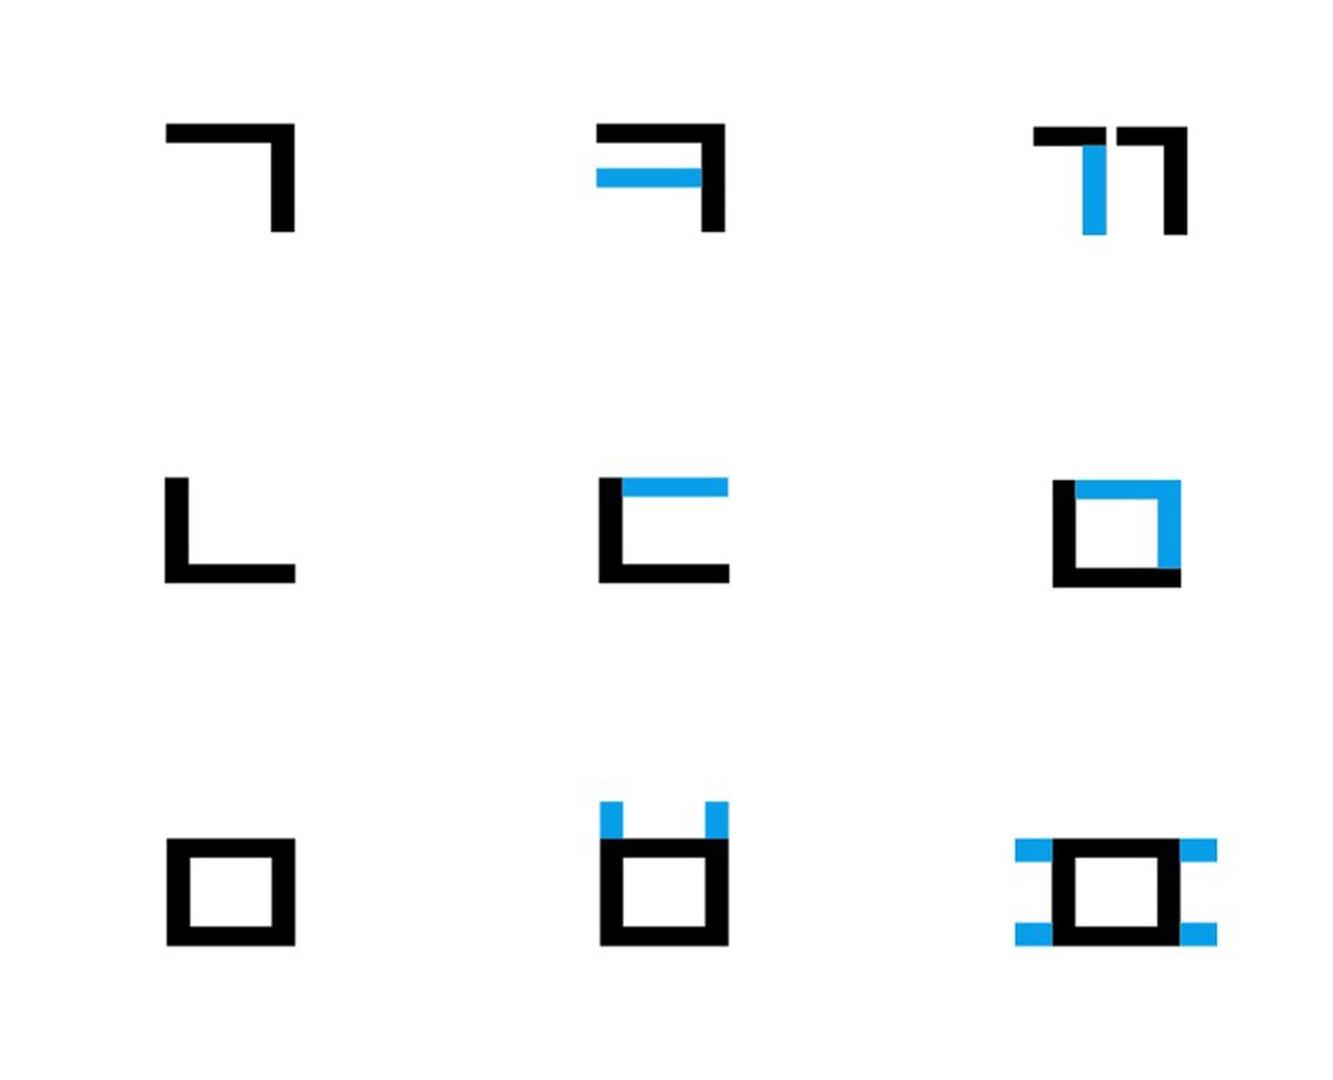 mootaa one dot 4.jpg